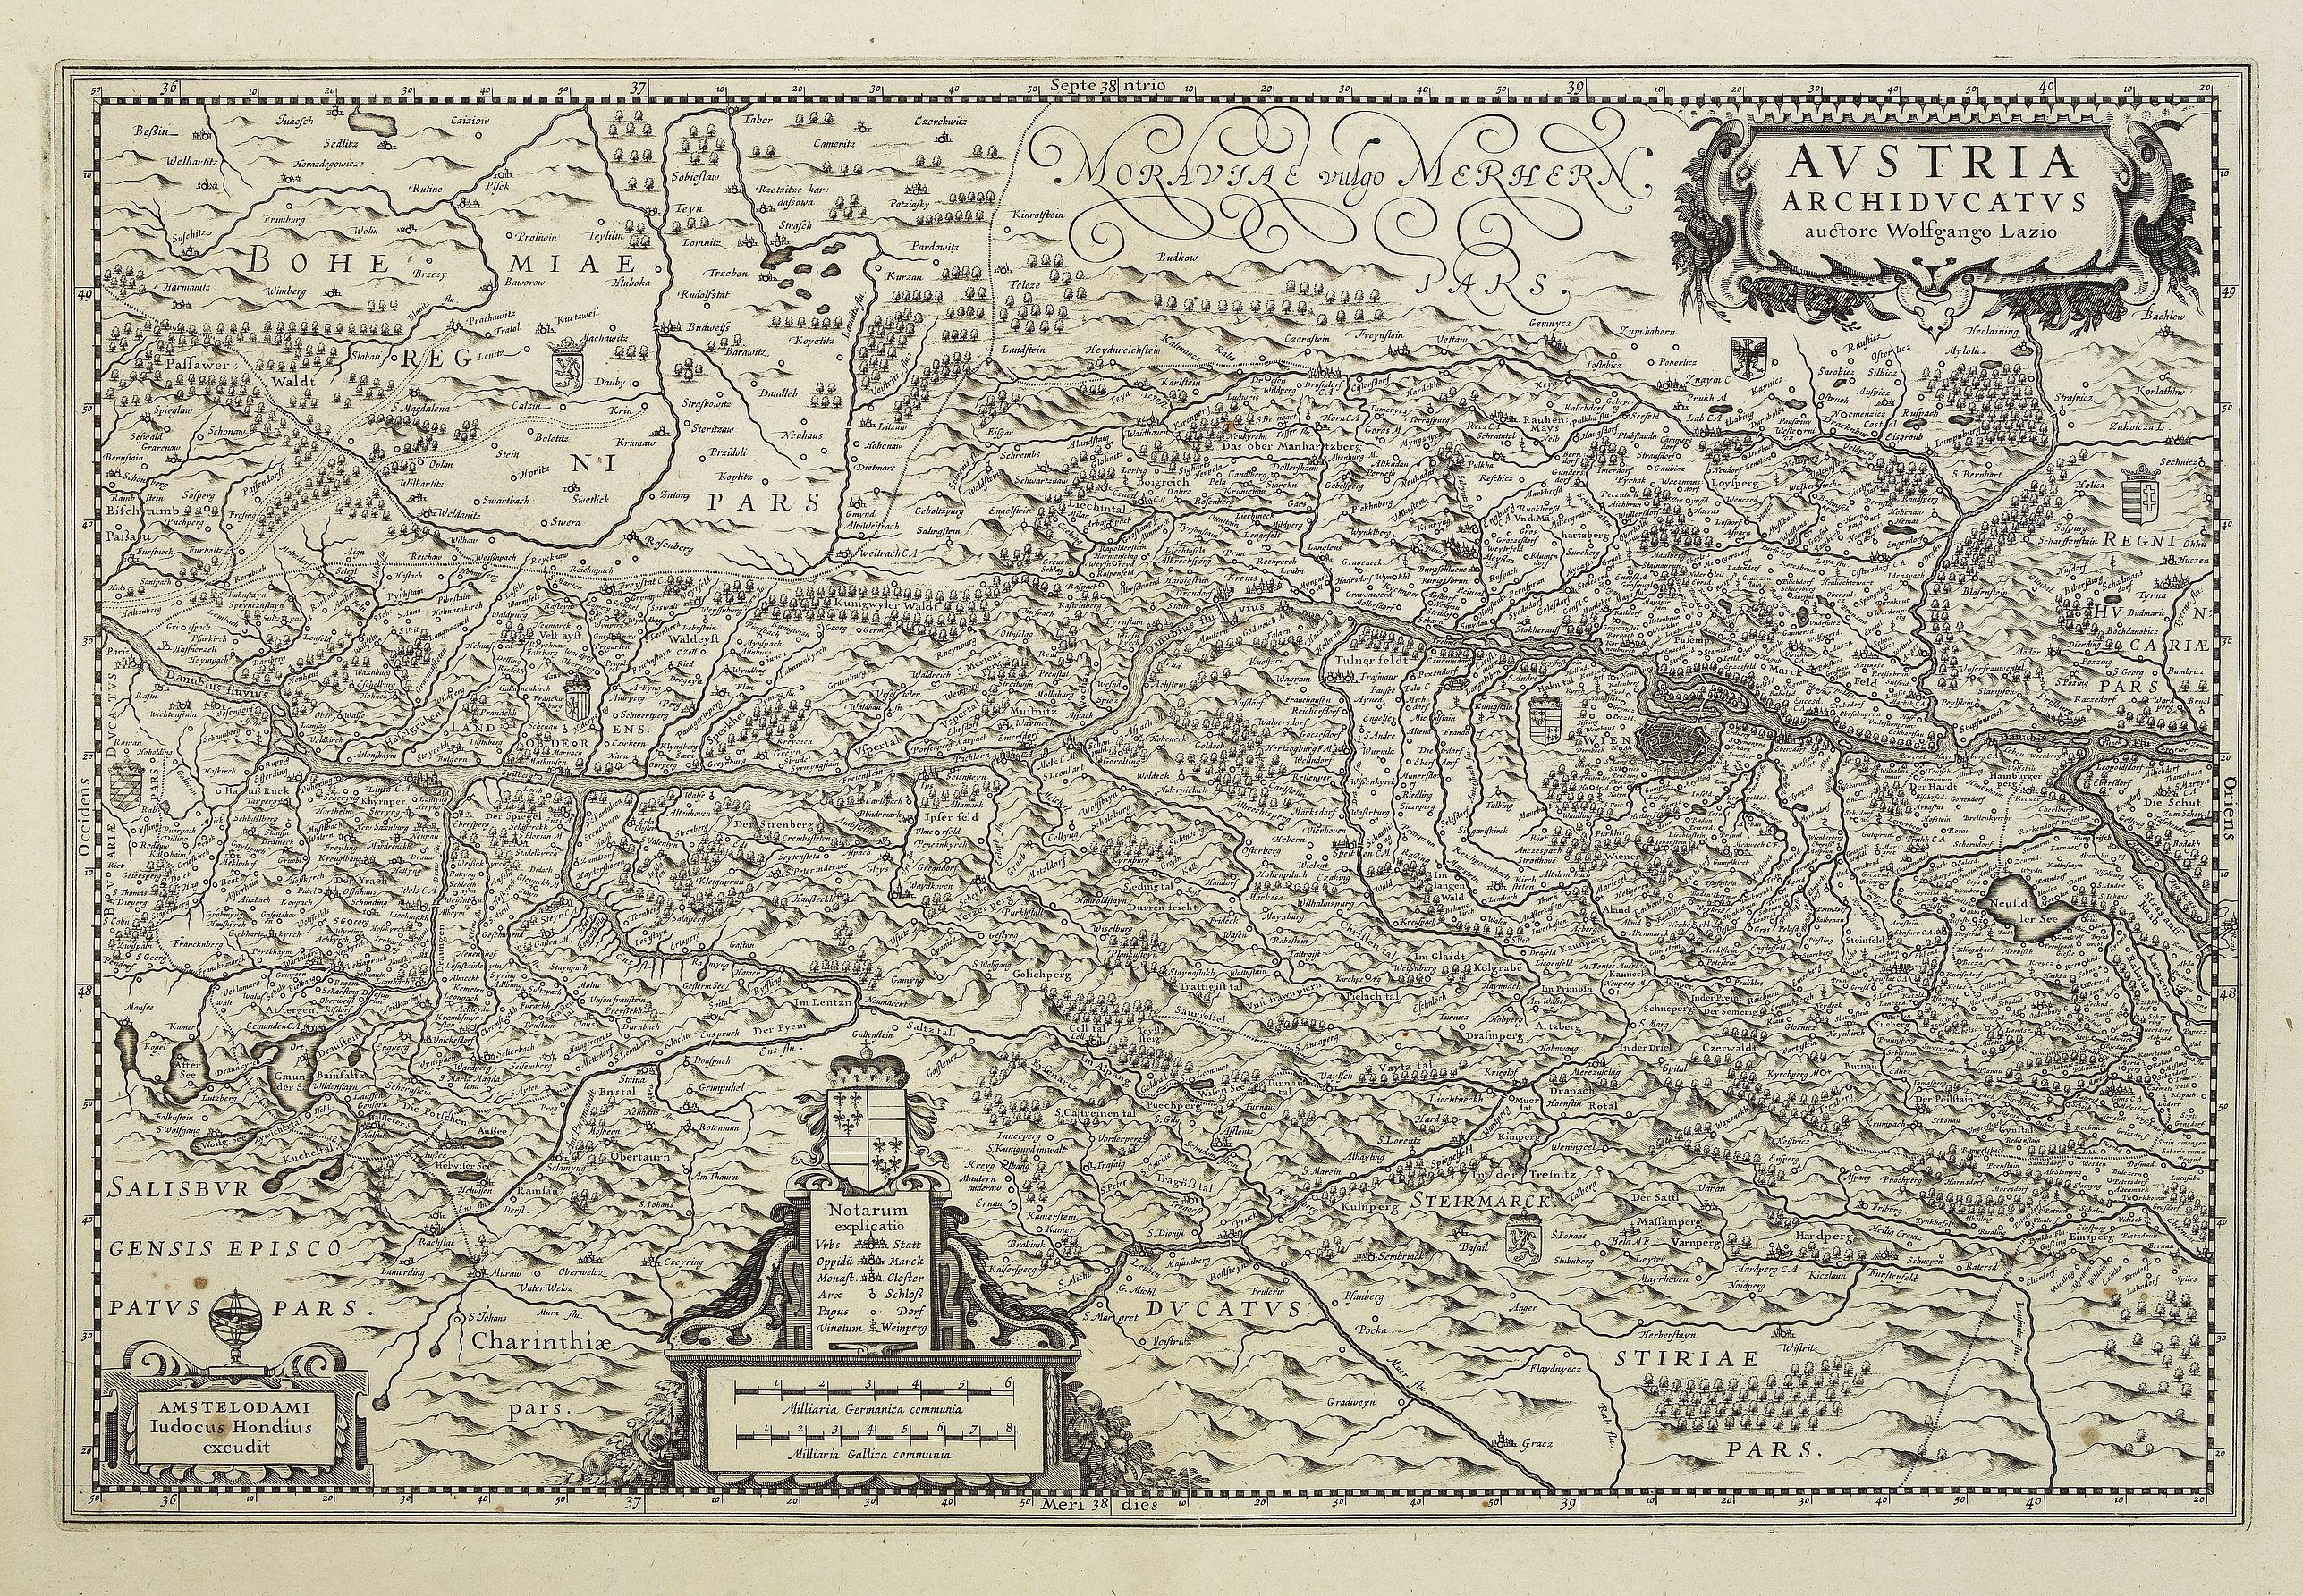 Old map by HONDIUS, J. - Austria Archiducatus auctore Wolfgango Lazio ...